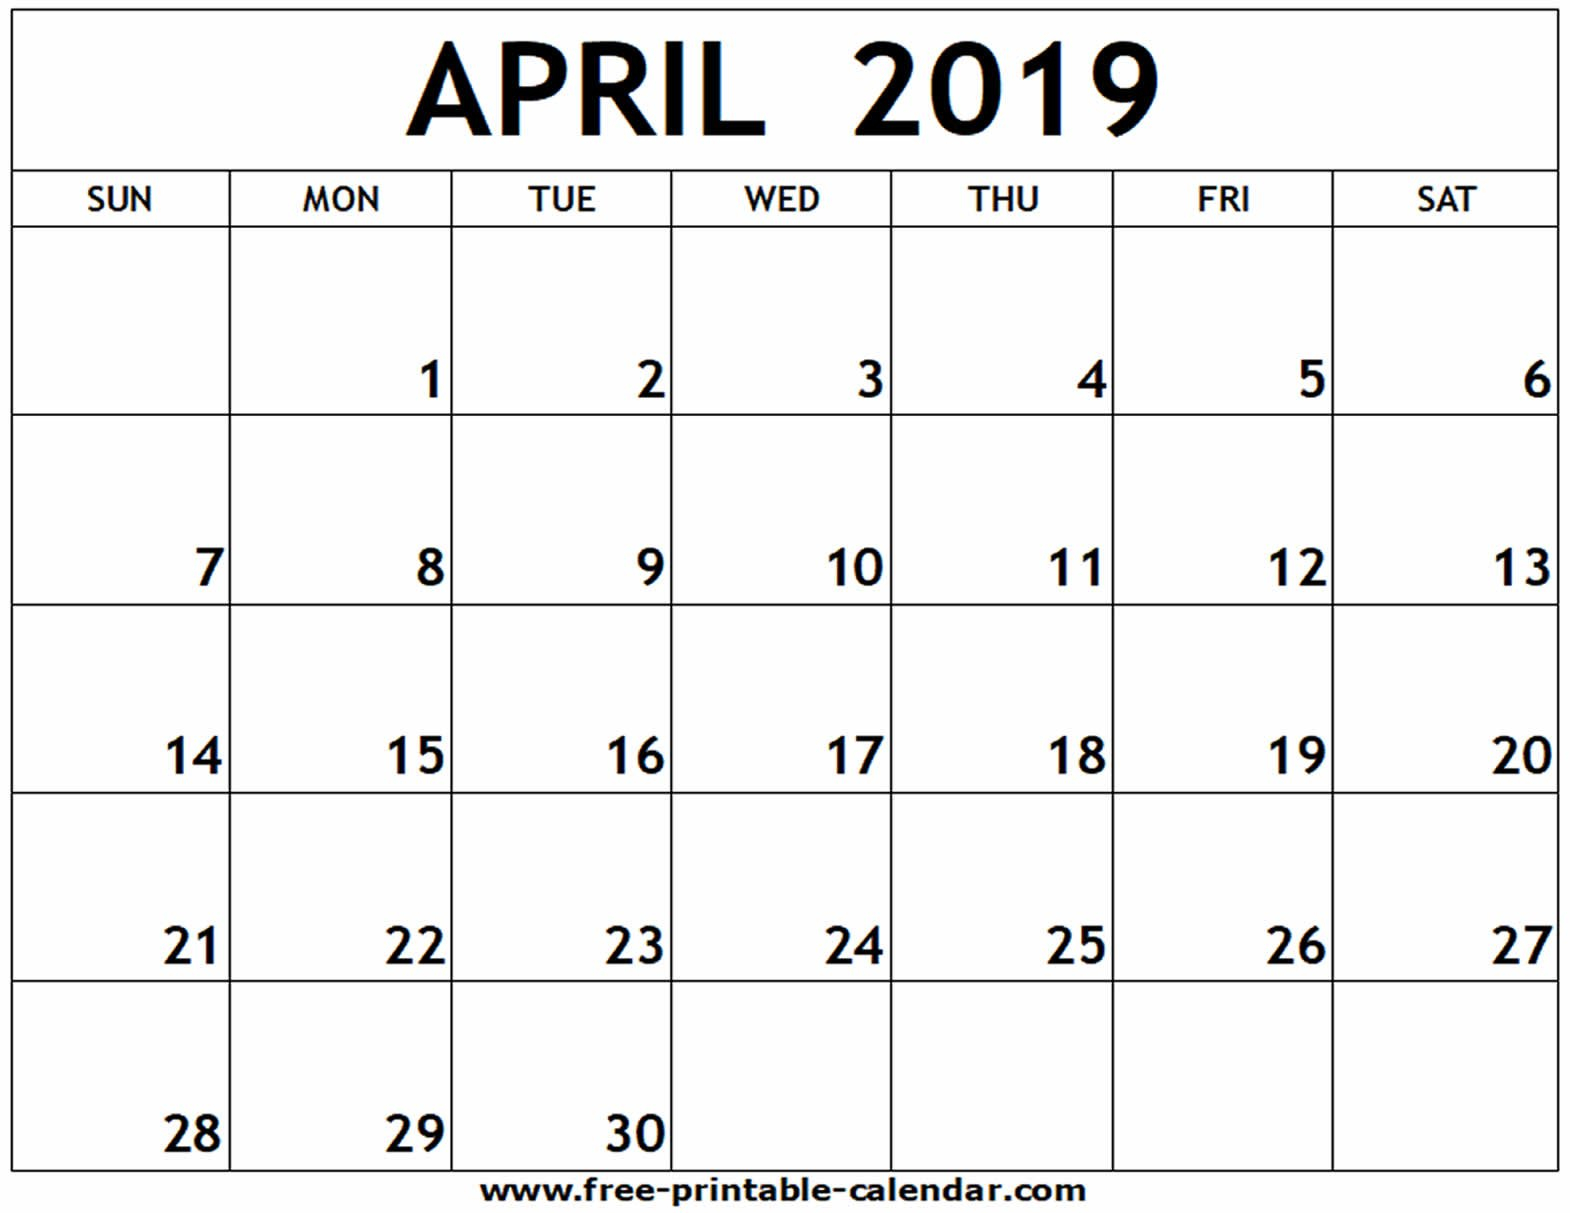 April 2019 Printable Calendar – Free Printable Calendar Calendar 2019 April Printable